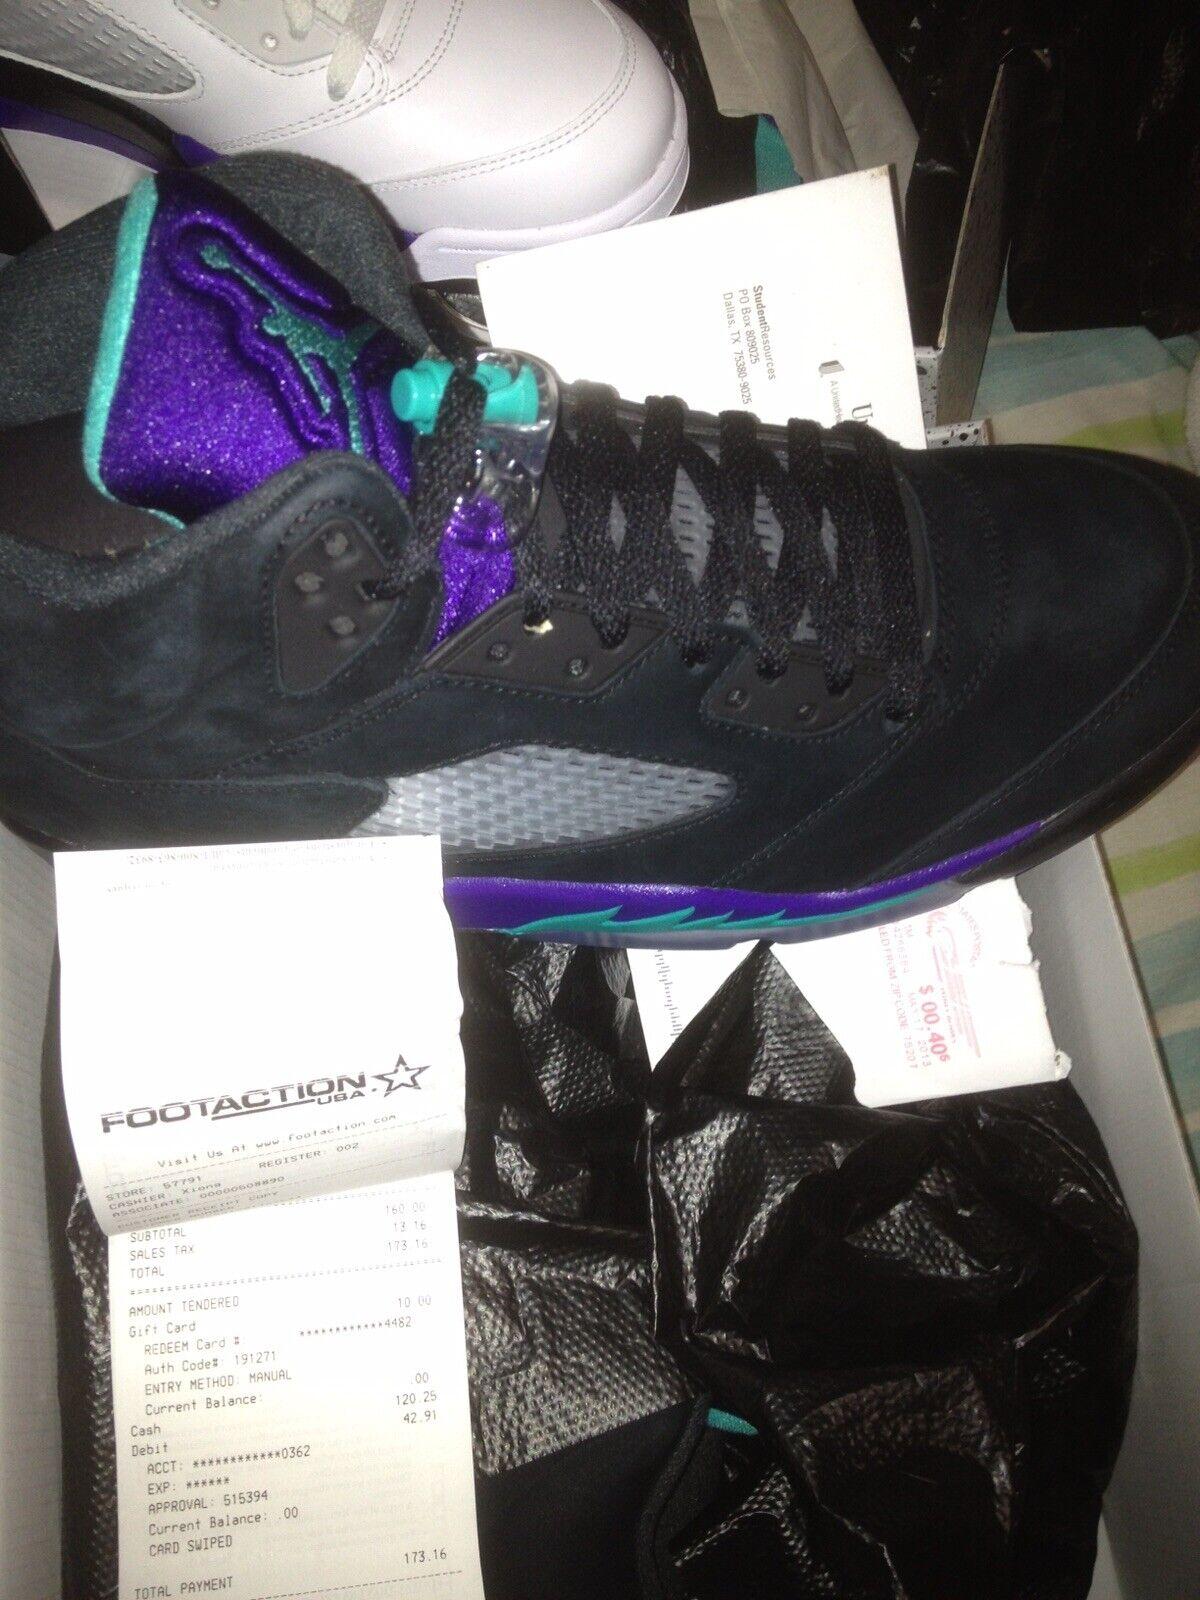 DS Jordan Retro V 5 Black Grapes Sz 10 shoes W  Receipt